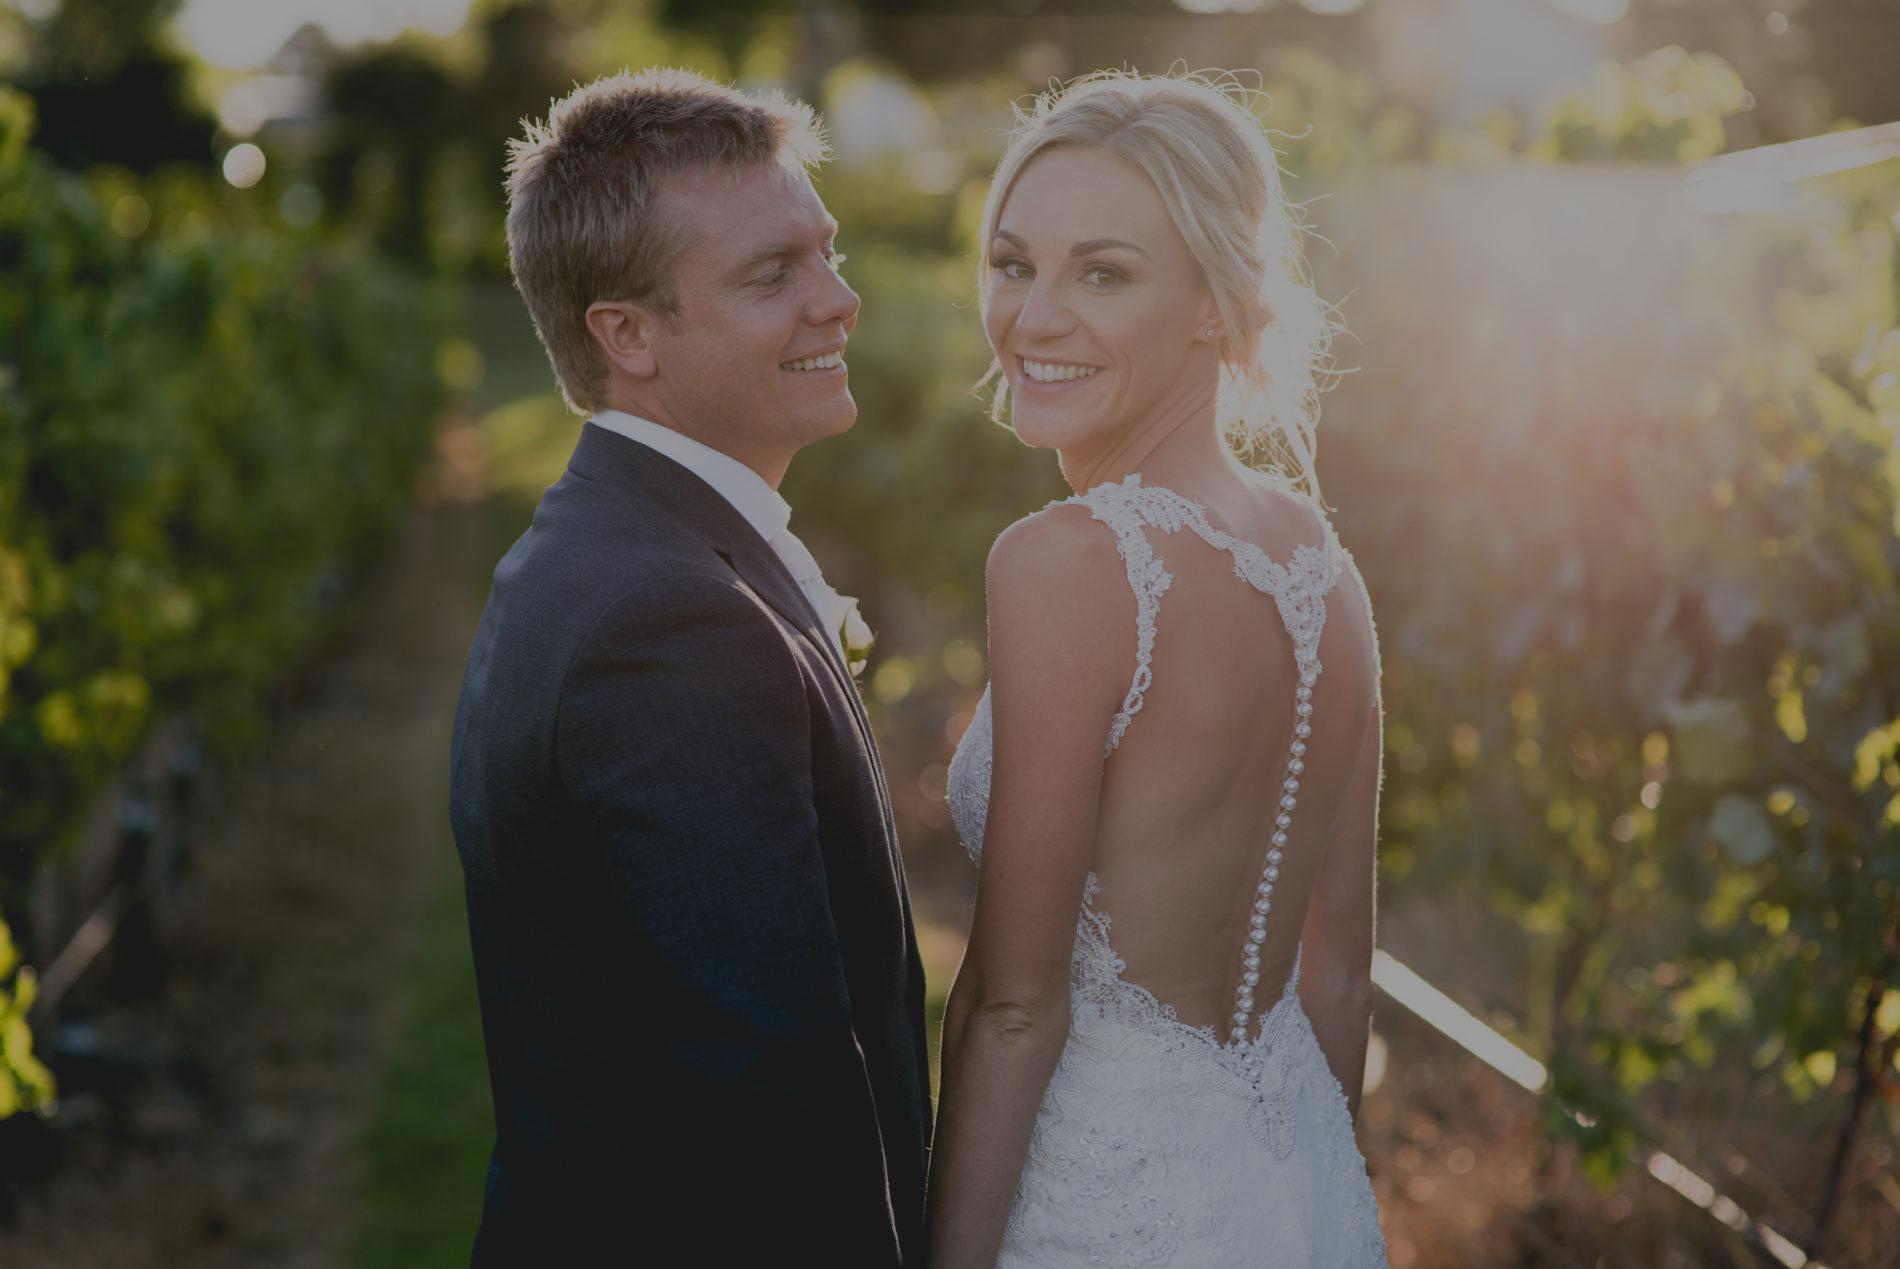 Wedding Slide – couple in vineyard